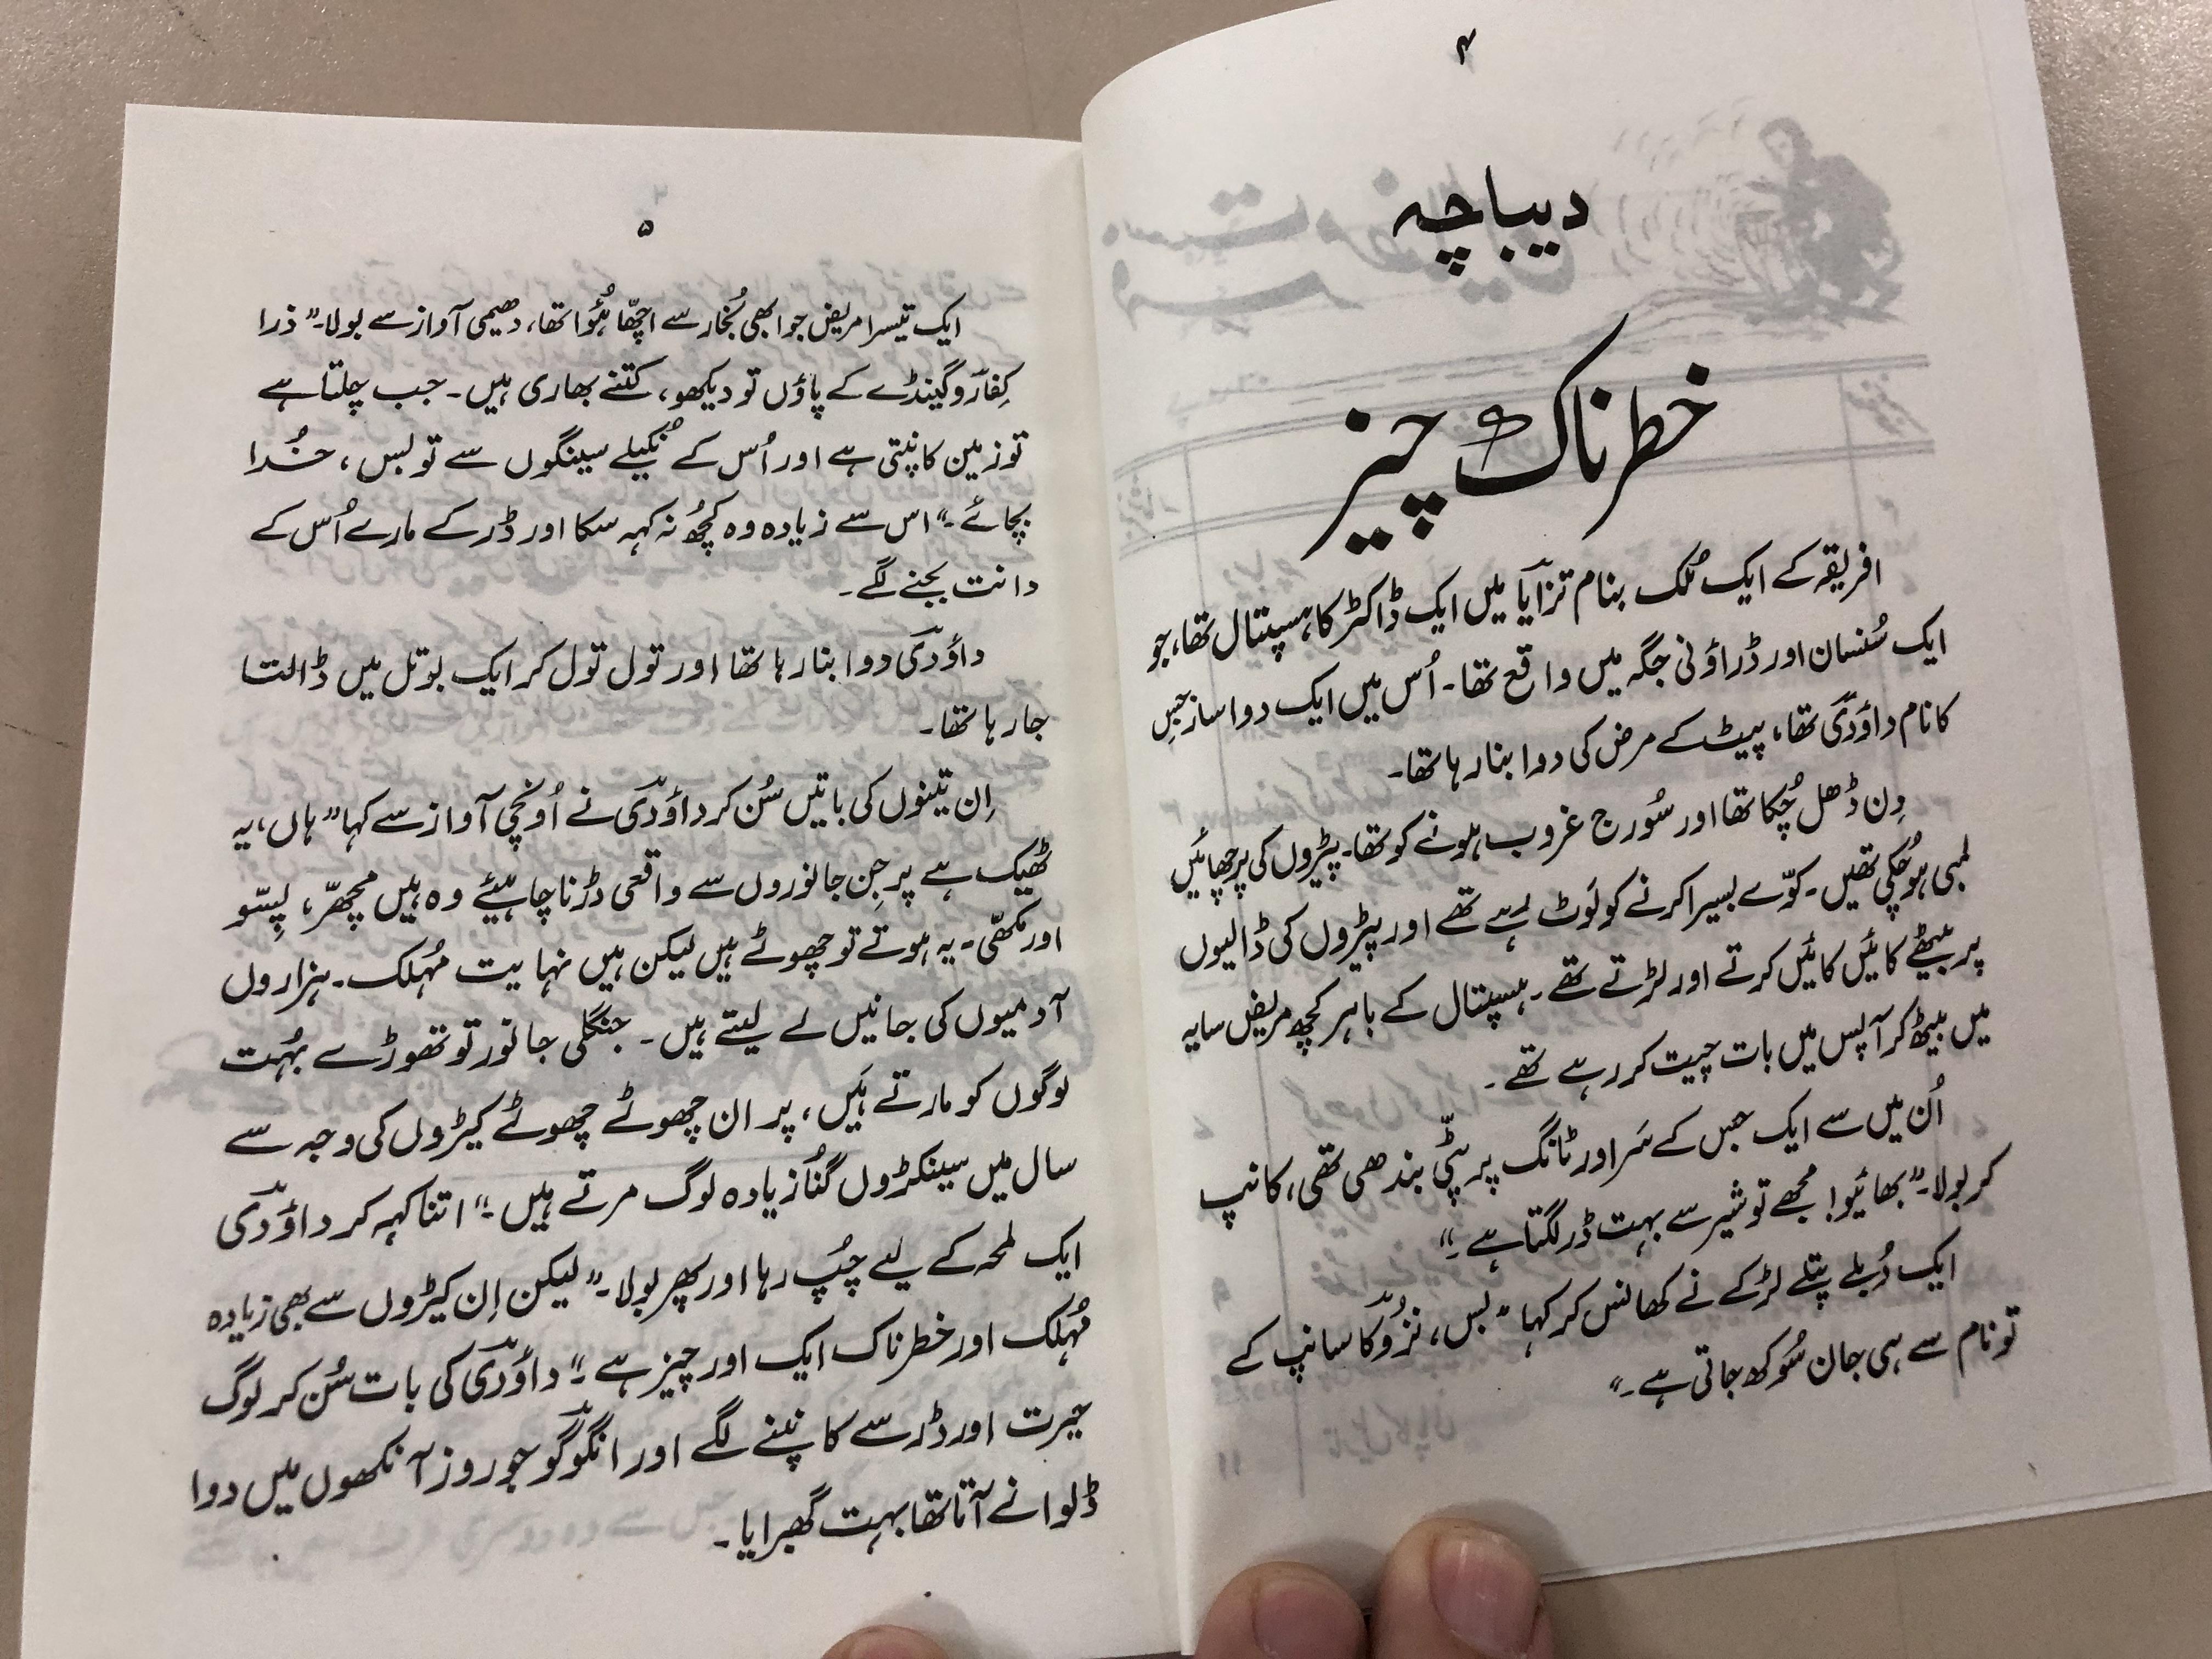 animal-stories-in-urdu-language-paperback-2018-masihi-isha-at-khana-brilliantly-written-animal-stories-with-a-forceful-spiritual-message-4-.jpg